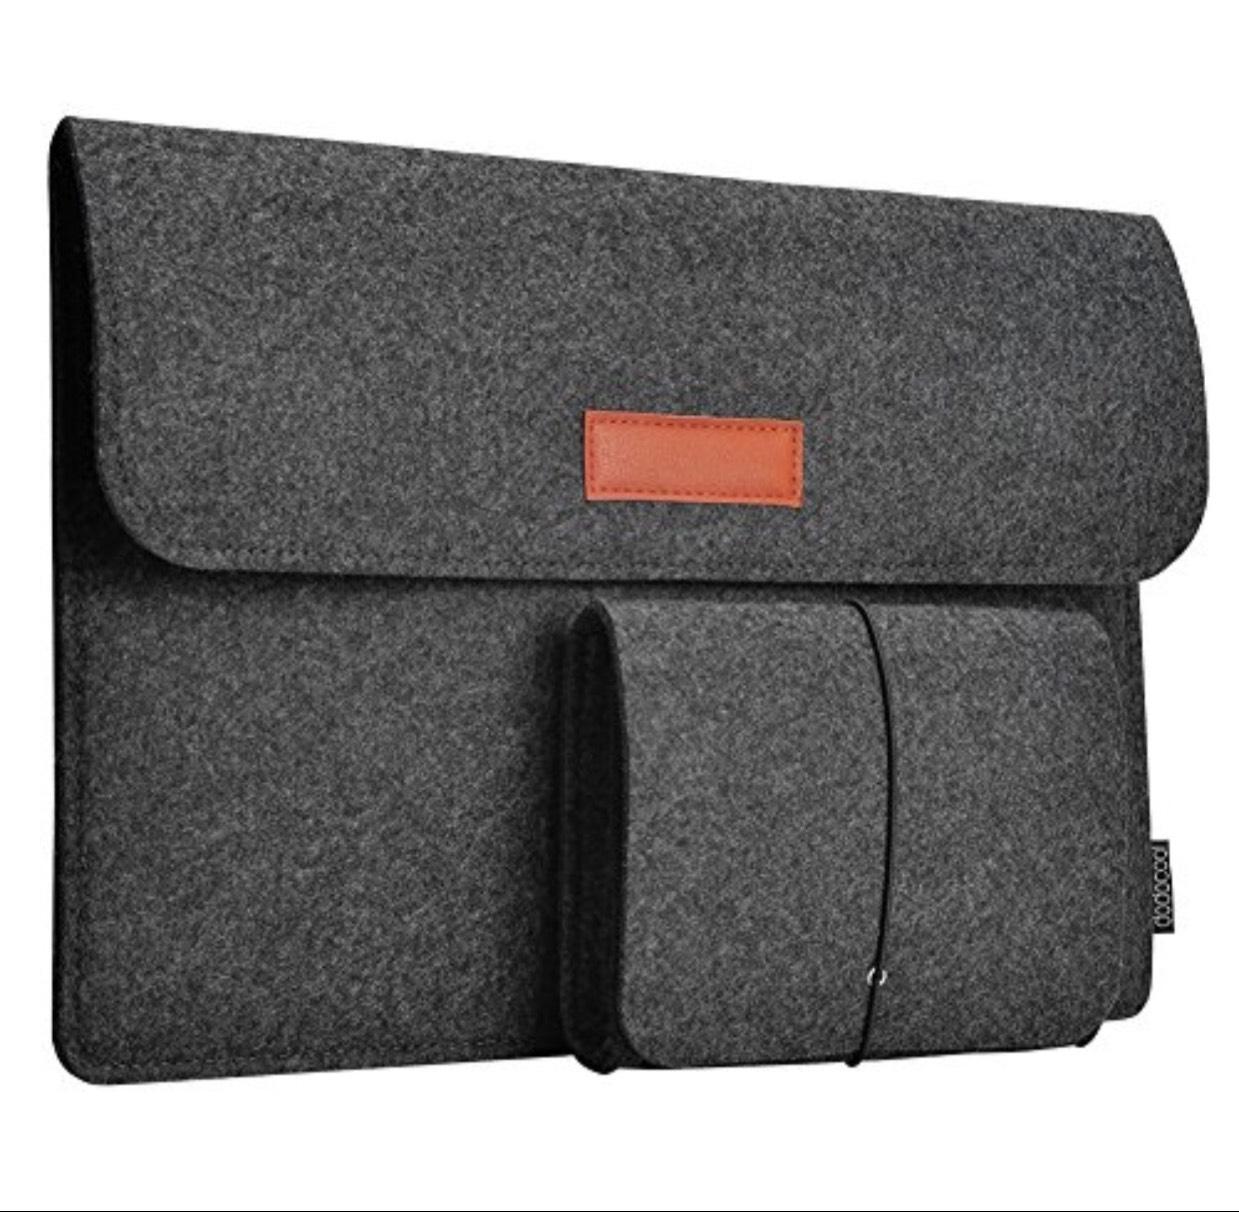 "[amazon.de] dodocool 13,3 Zoll Filz Sleeve Hülle Ultrabook Laptop Tasche für 13"" Macbook Air / Pro Retina 12,9 Zoll iPad Pro / Hell Grau & Dunkel Grau um 5,99 € !!"